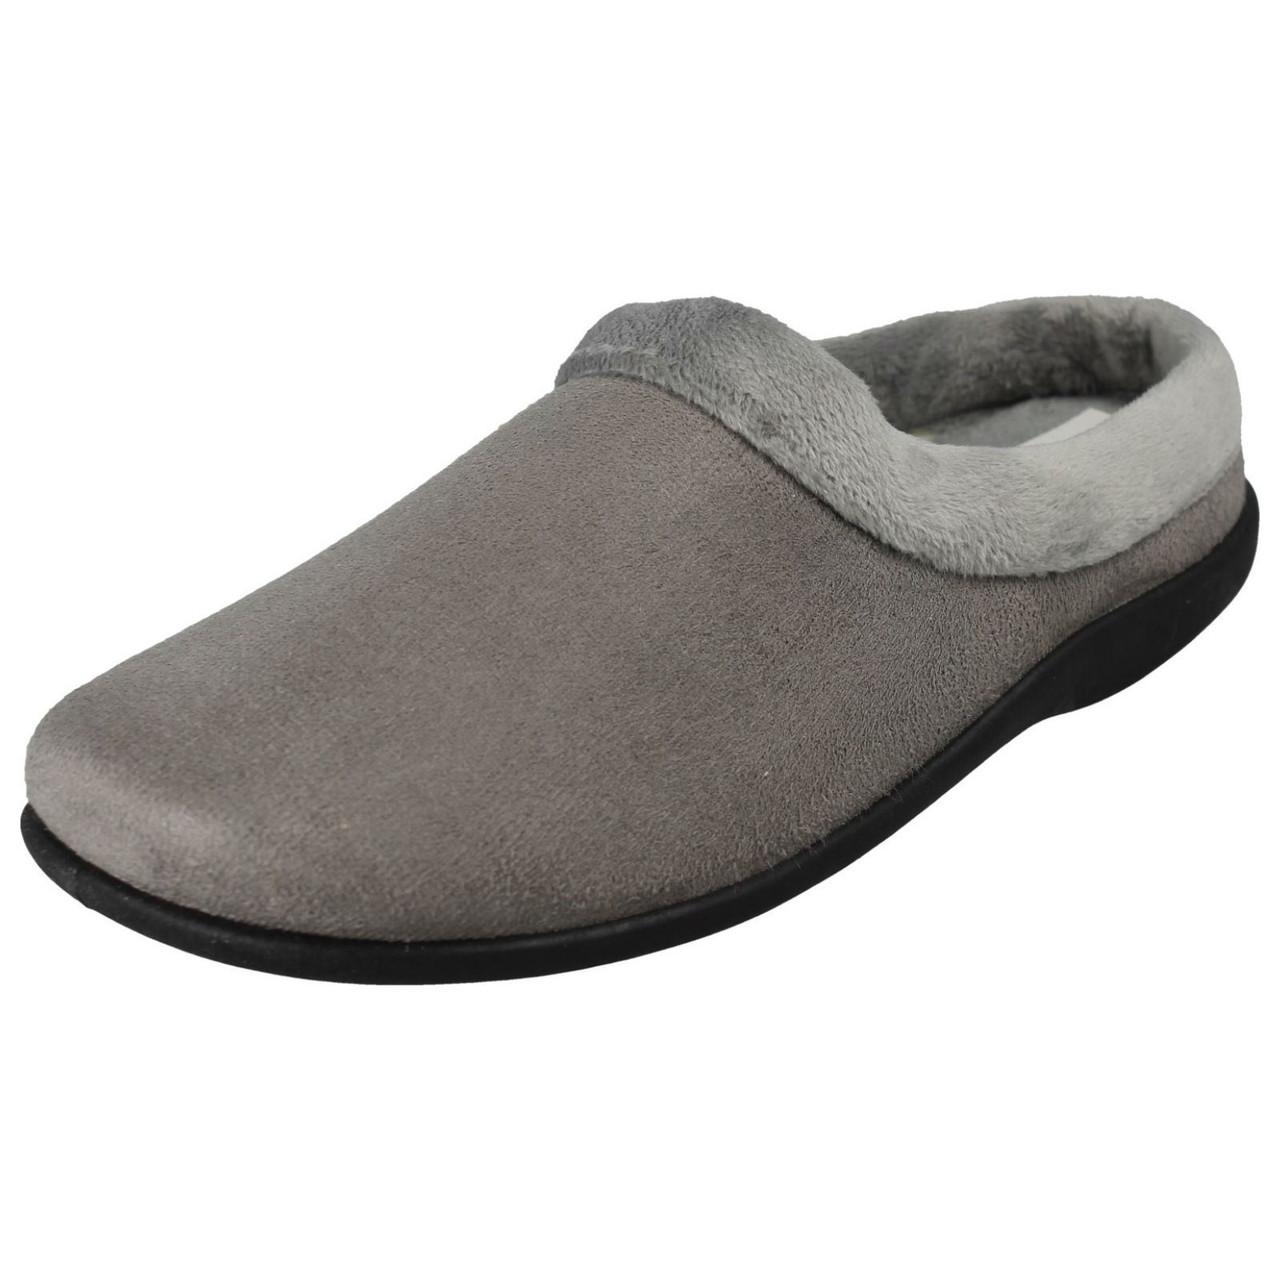 Claire Ladies Sleephhh Slip On Slippers